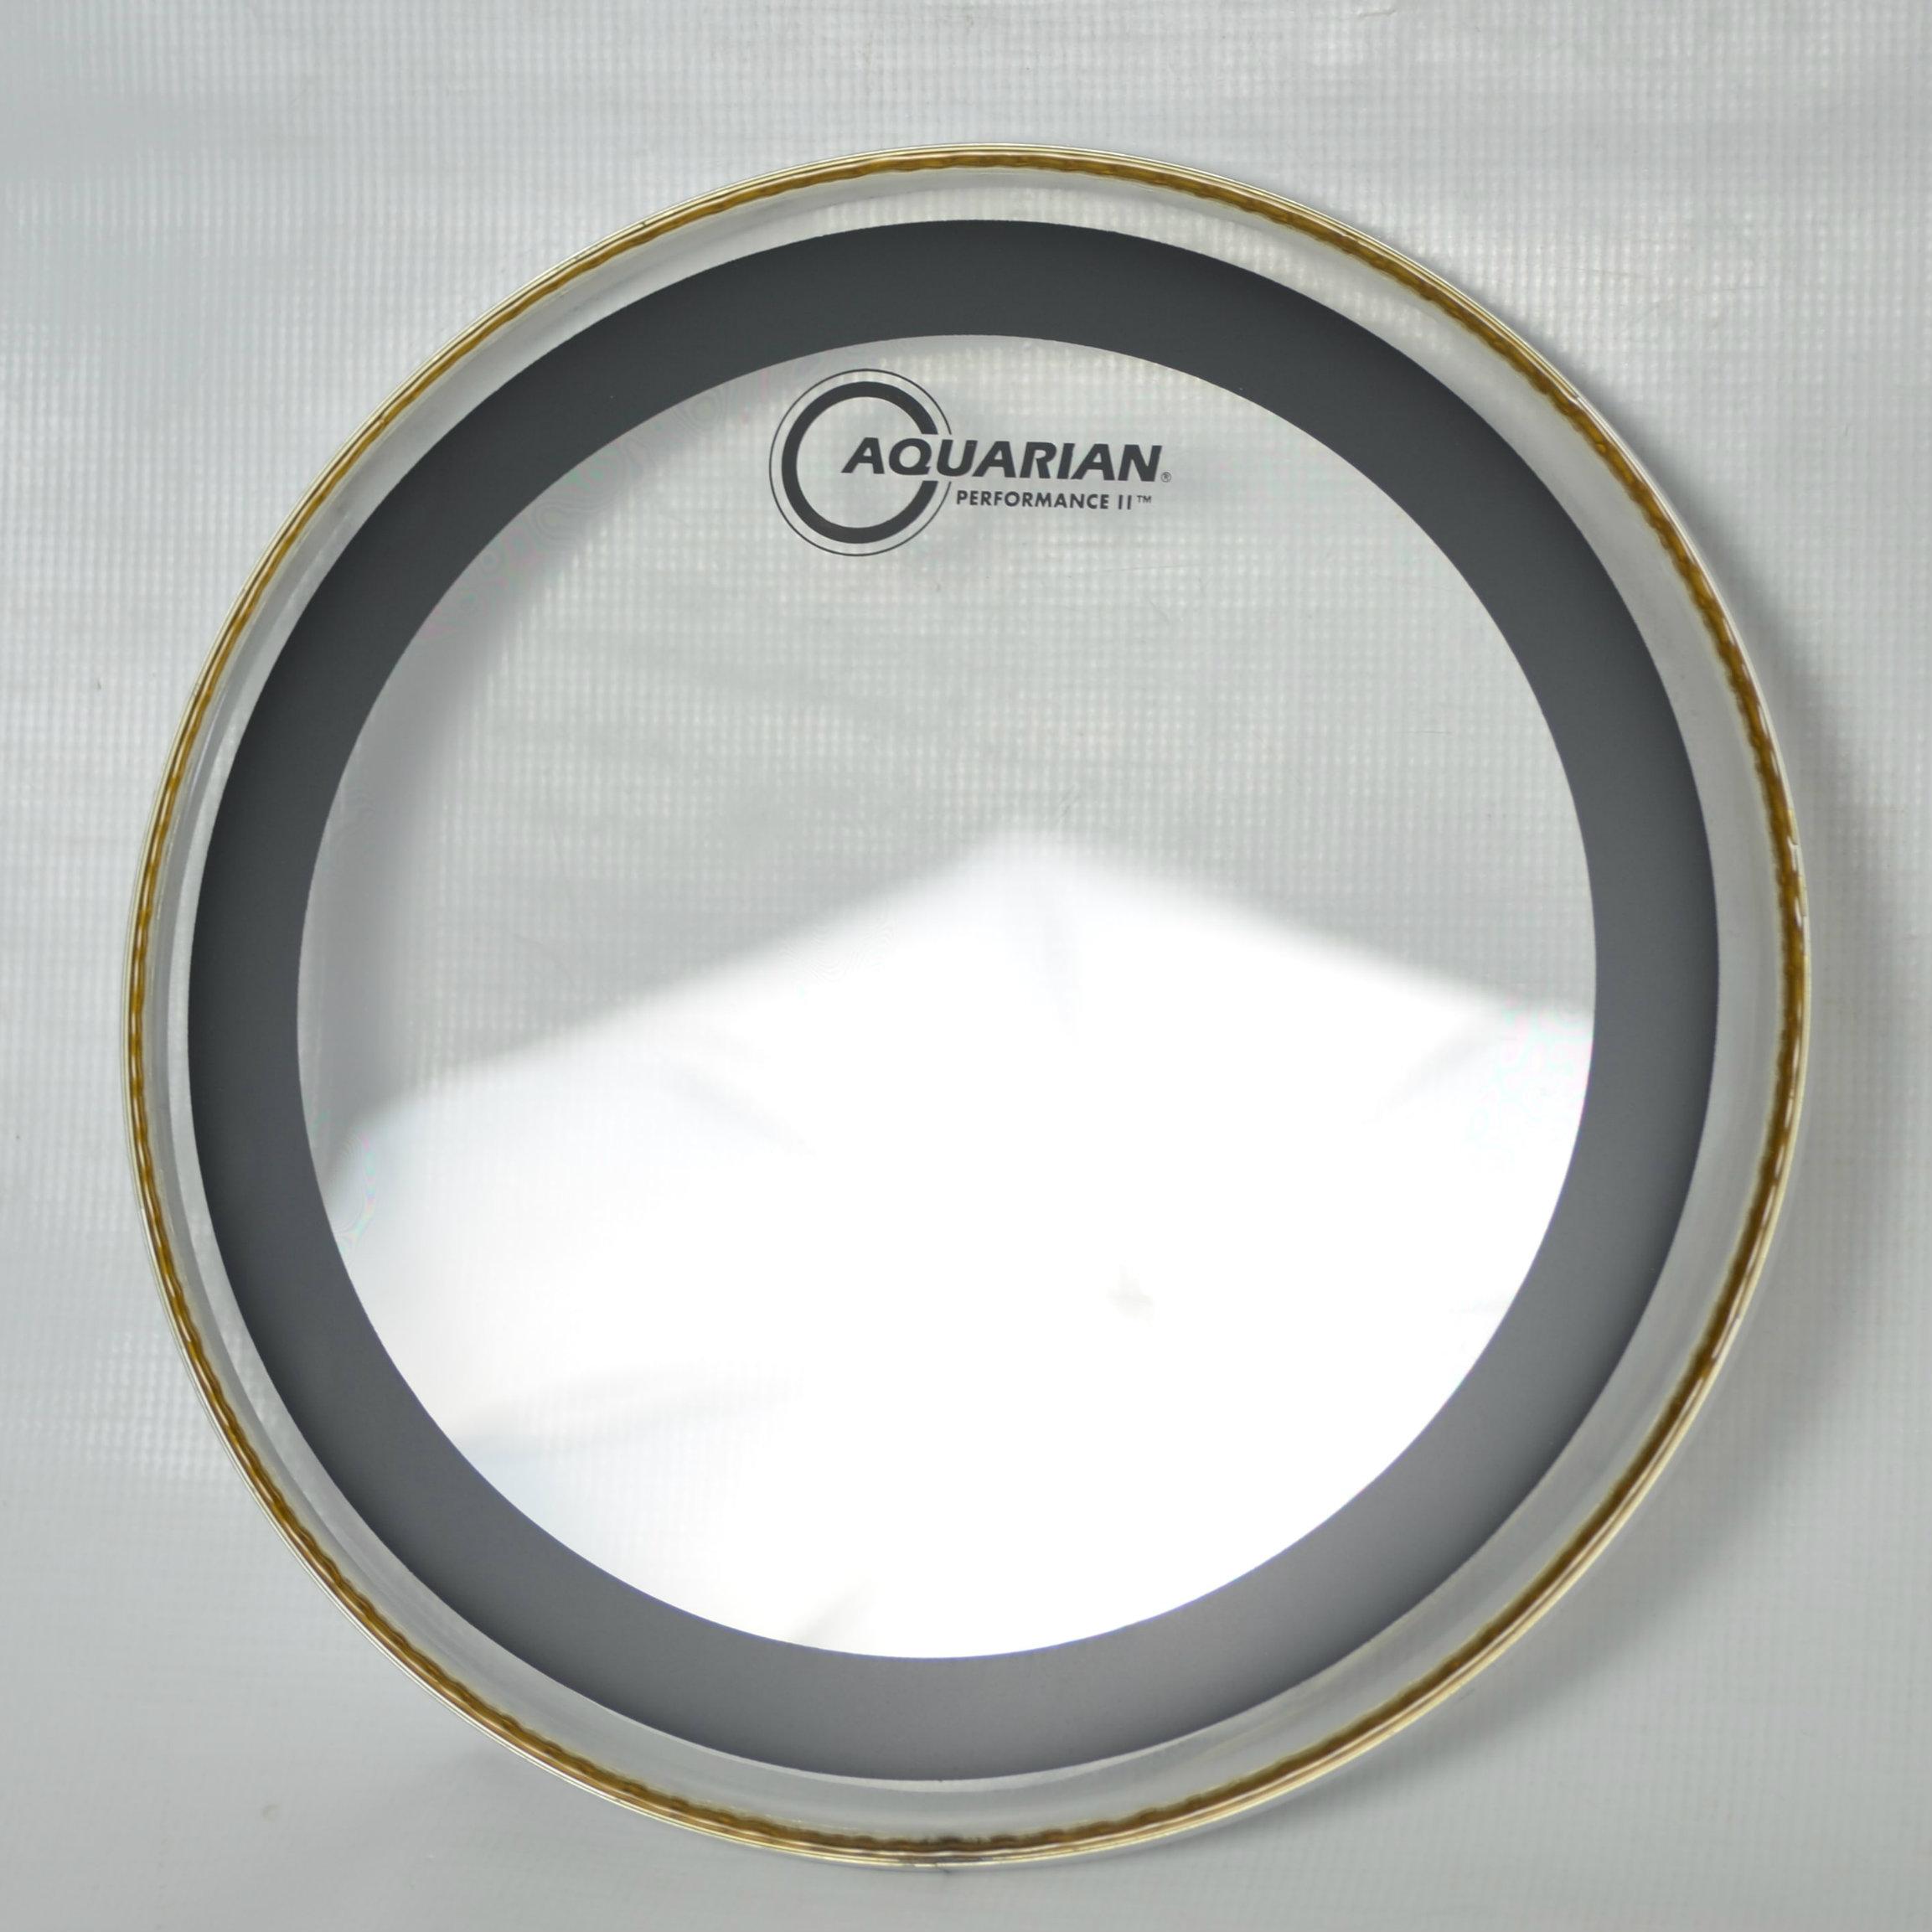 Aquarian Performance II drumhead